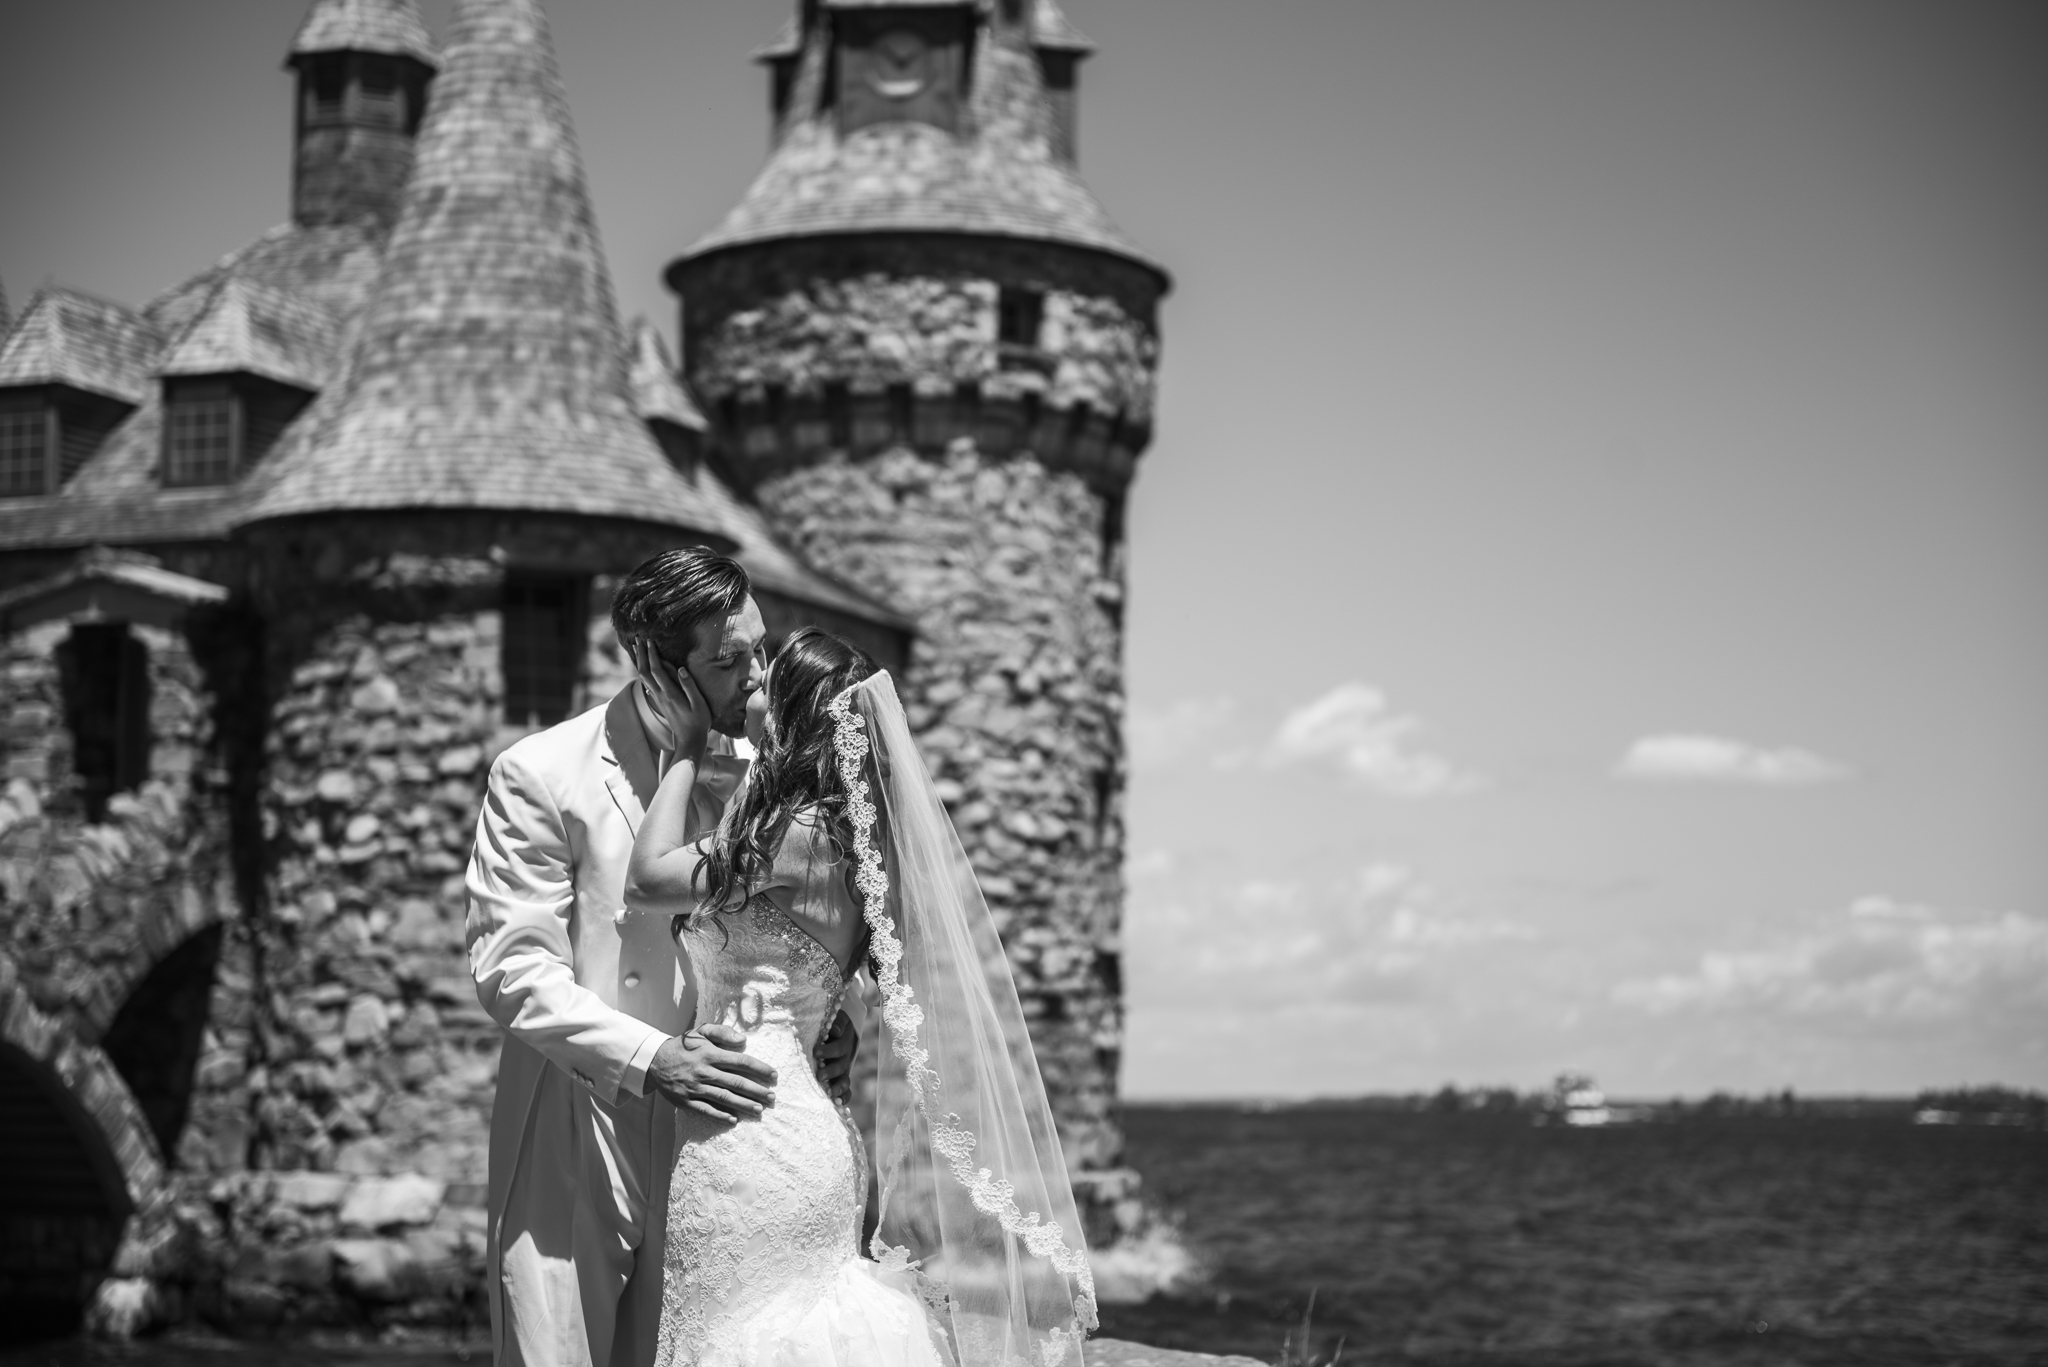 A&K-Wedding-Online-FirstLook-73.jpg